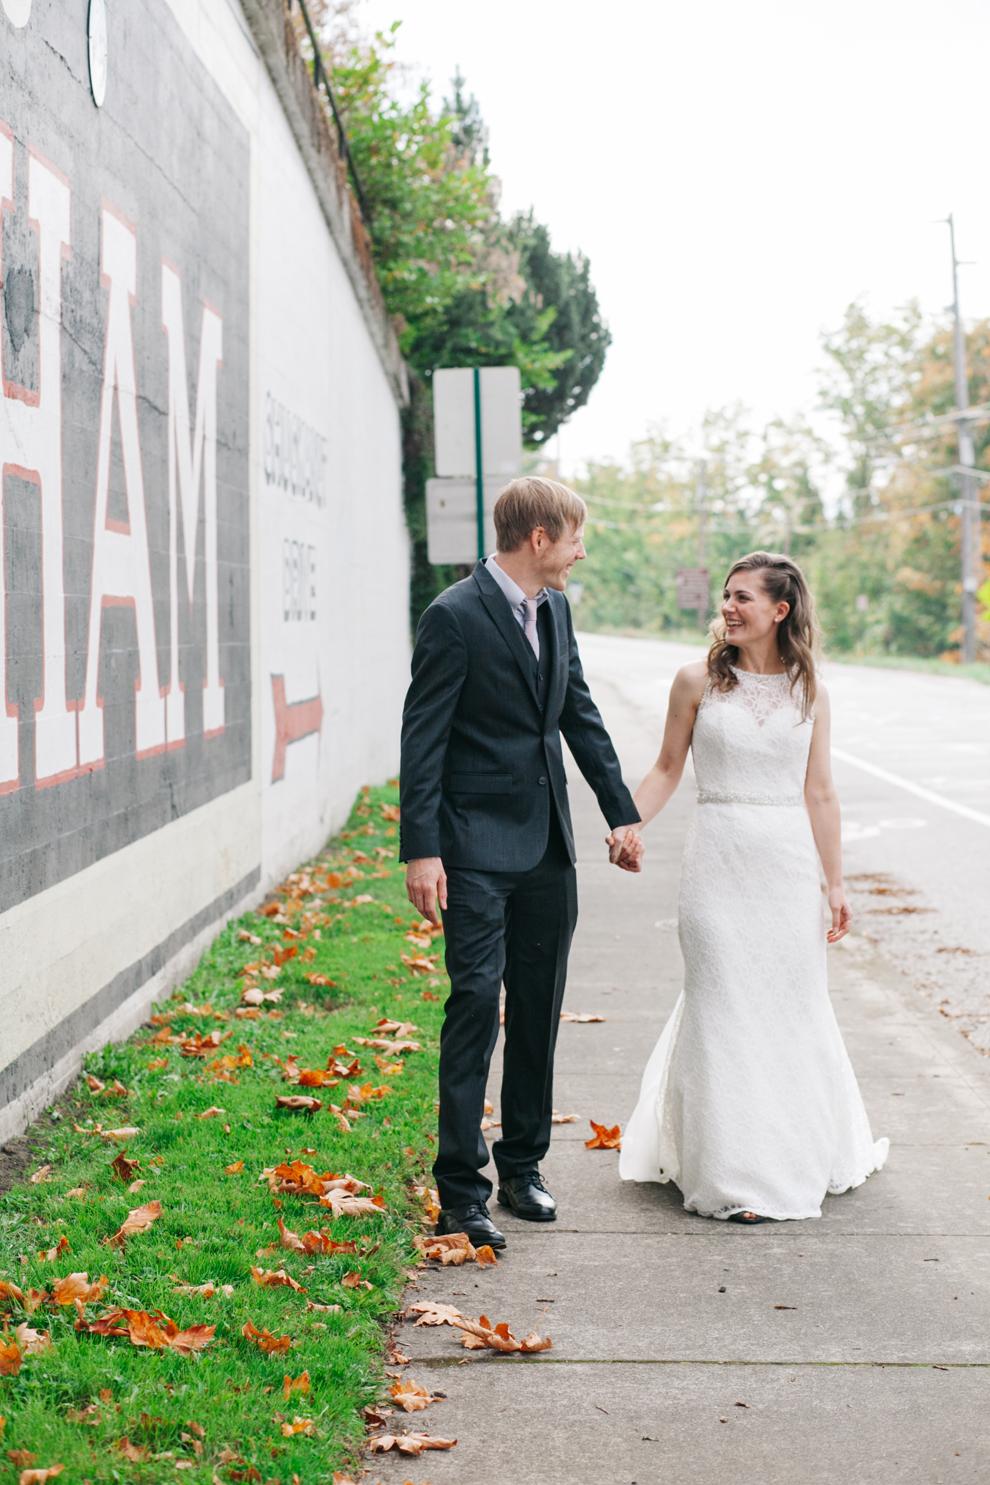 039-bellingham-washington-wedding-first-look-downtown-katheryn-moran-photography.jpg